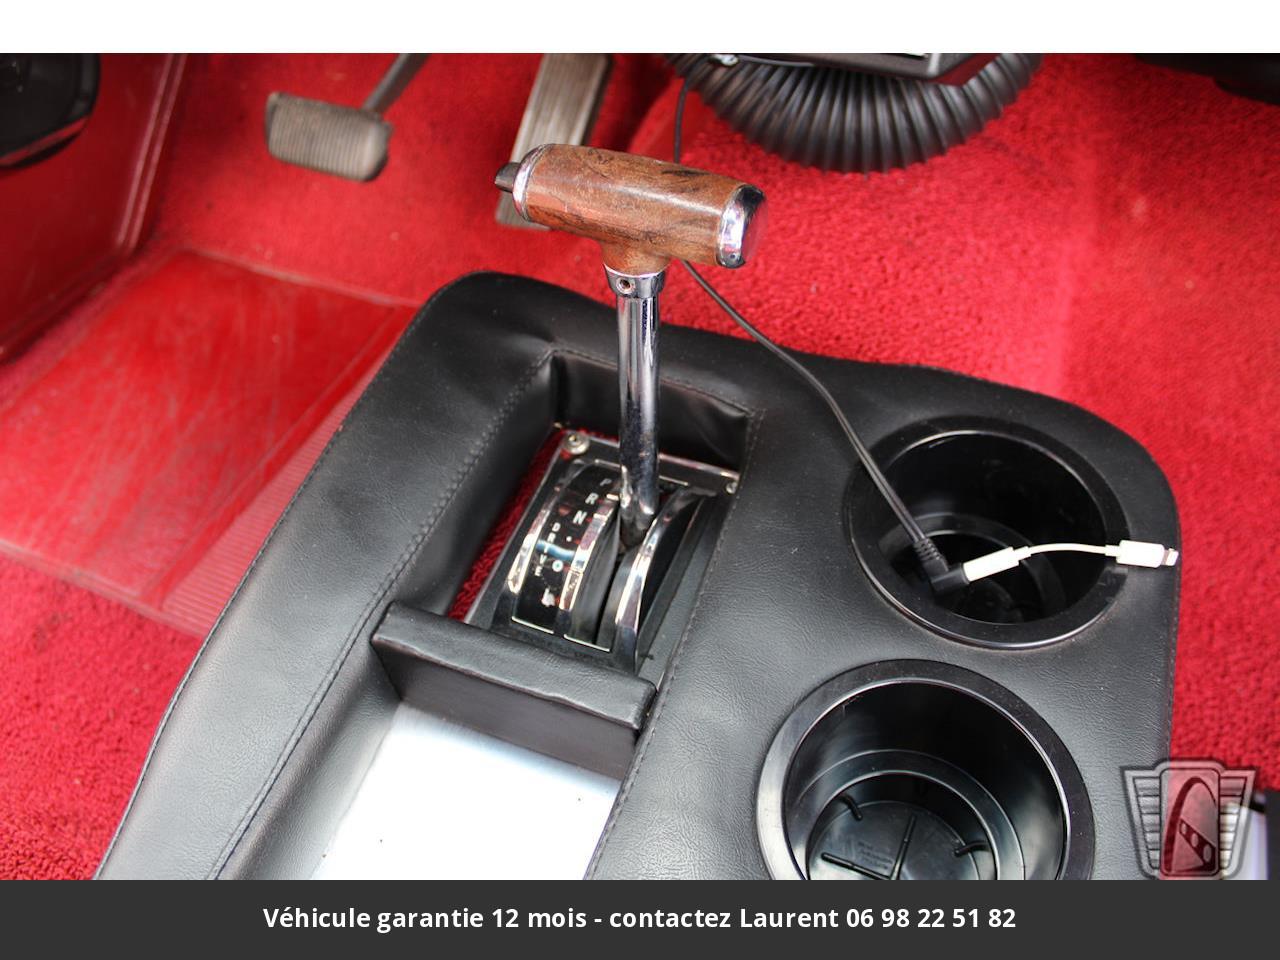 Ford Mustang Fastback v8 289 1965 prix tout compris